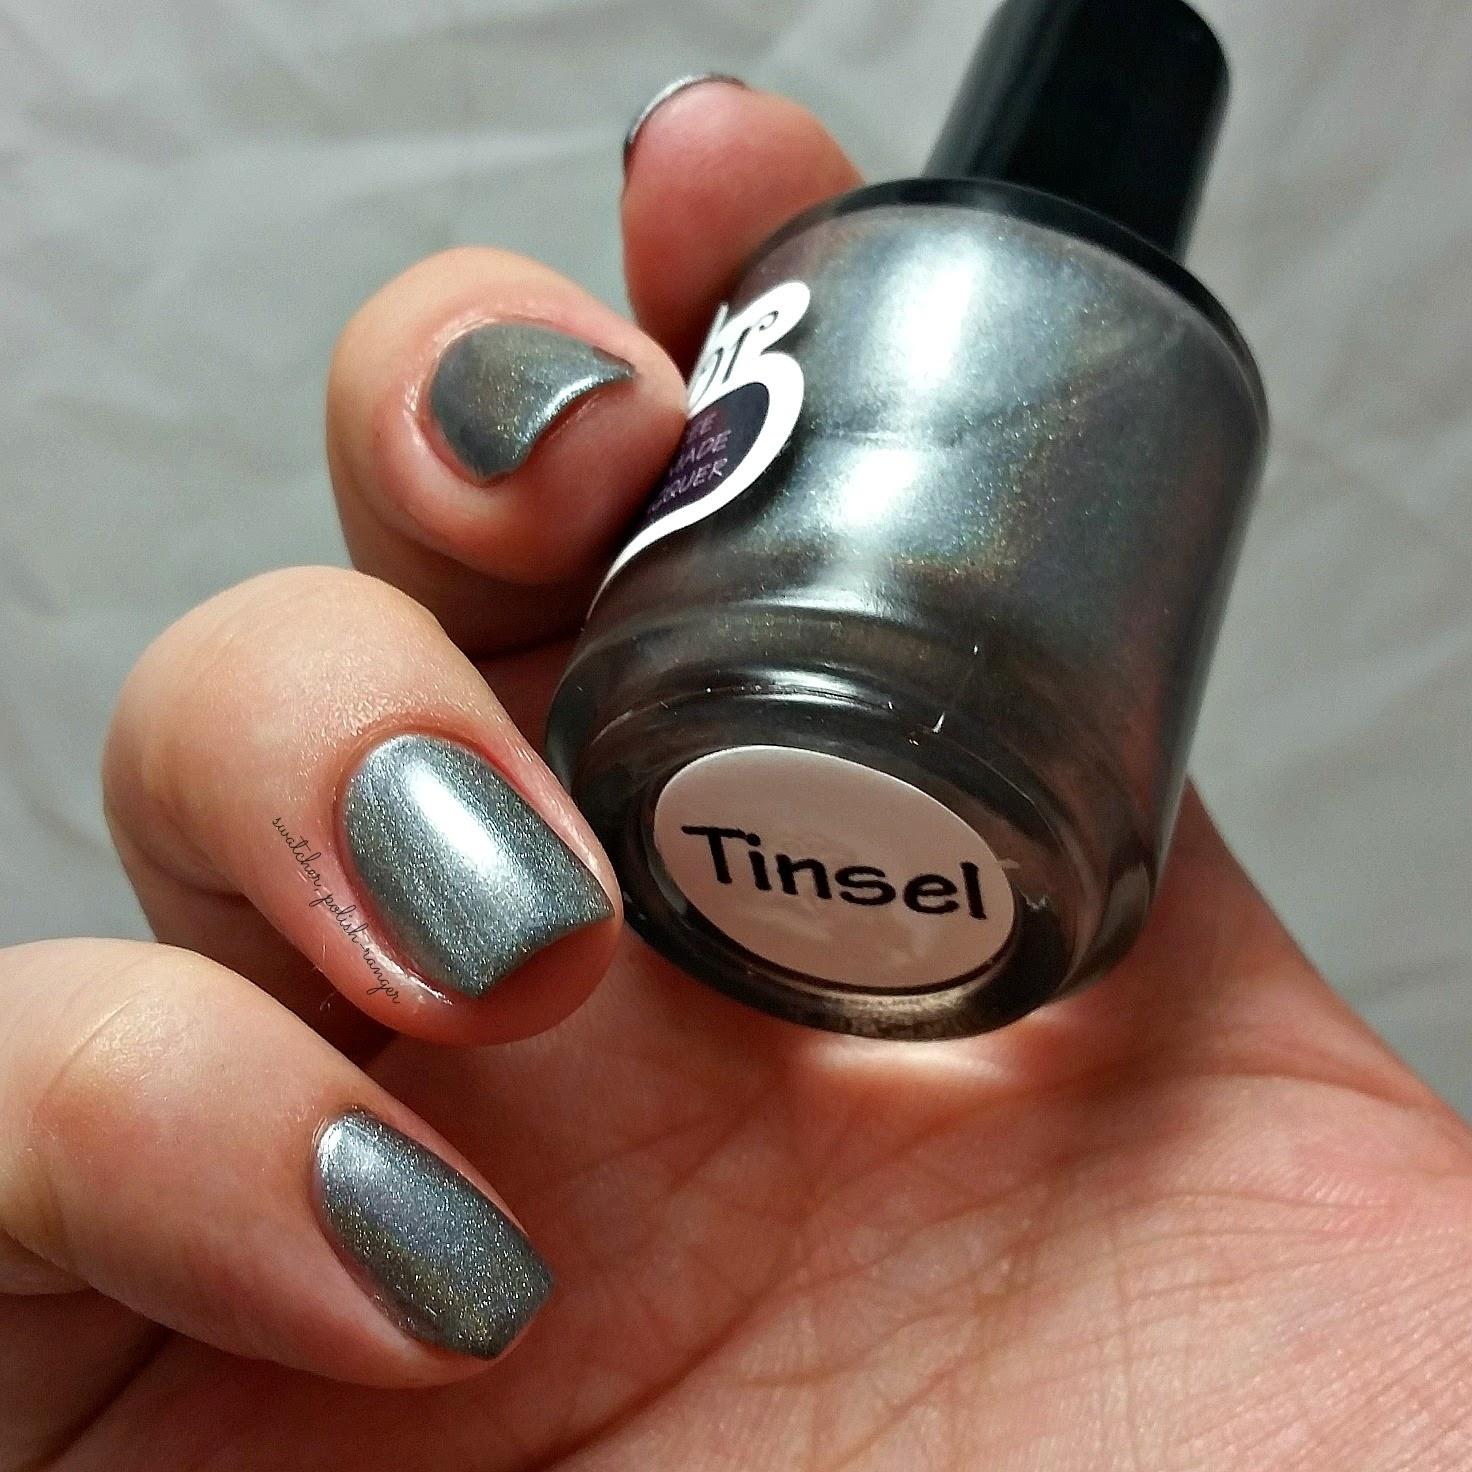 swatcher, polish-ranger | Splendor Nail Lacquer Tinsel swatch